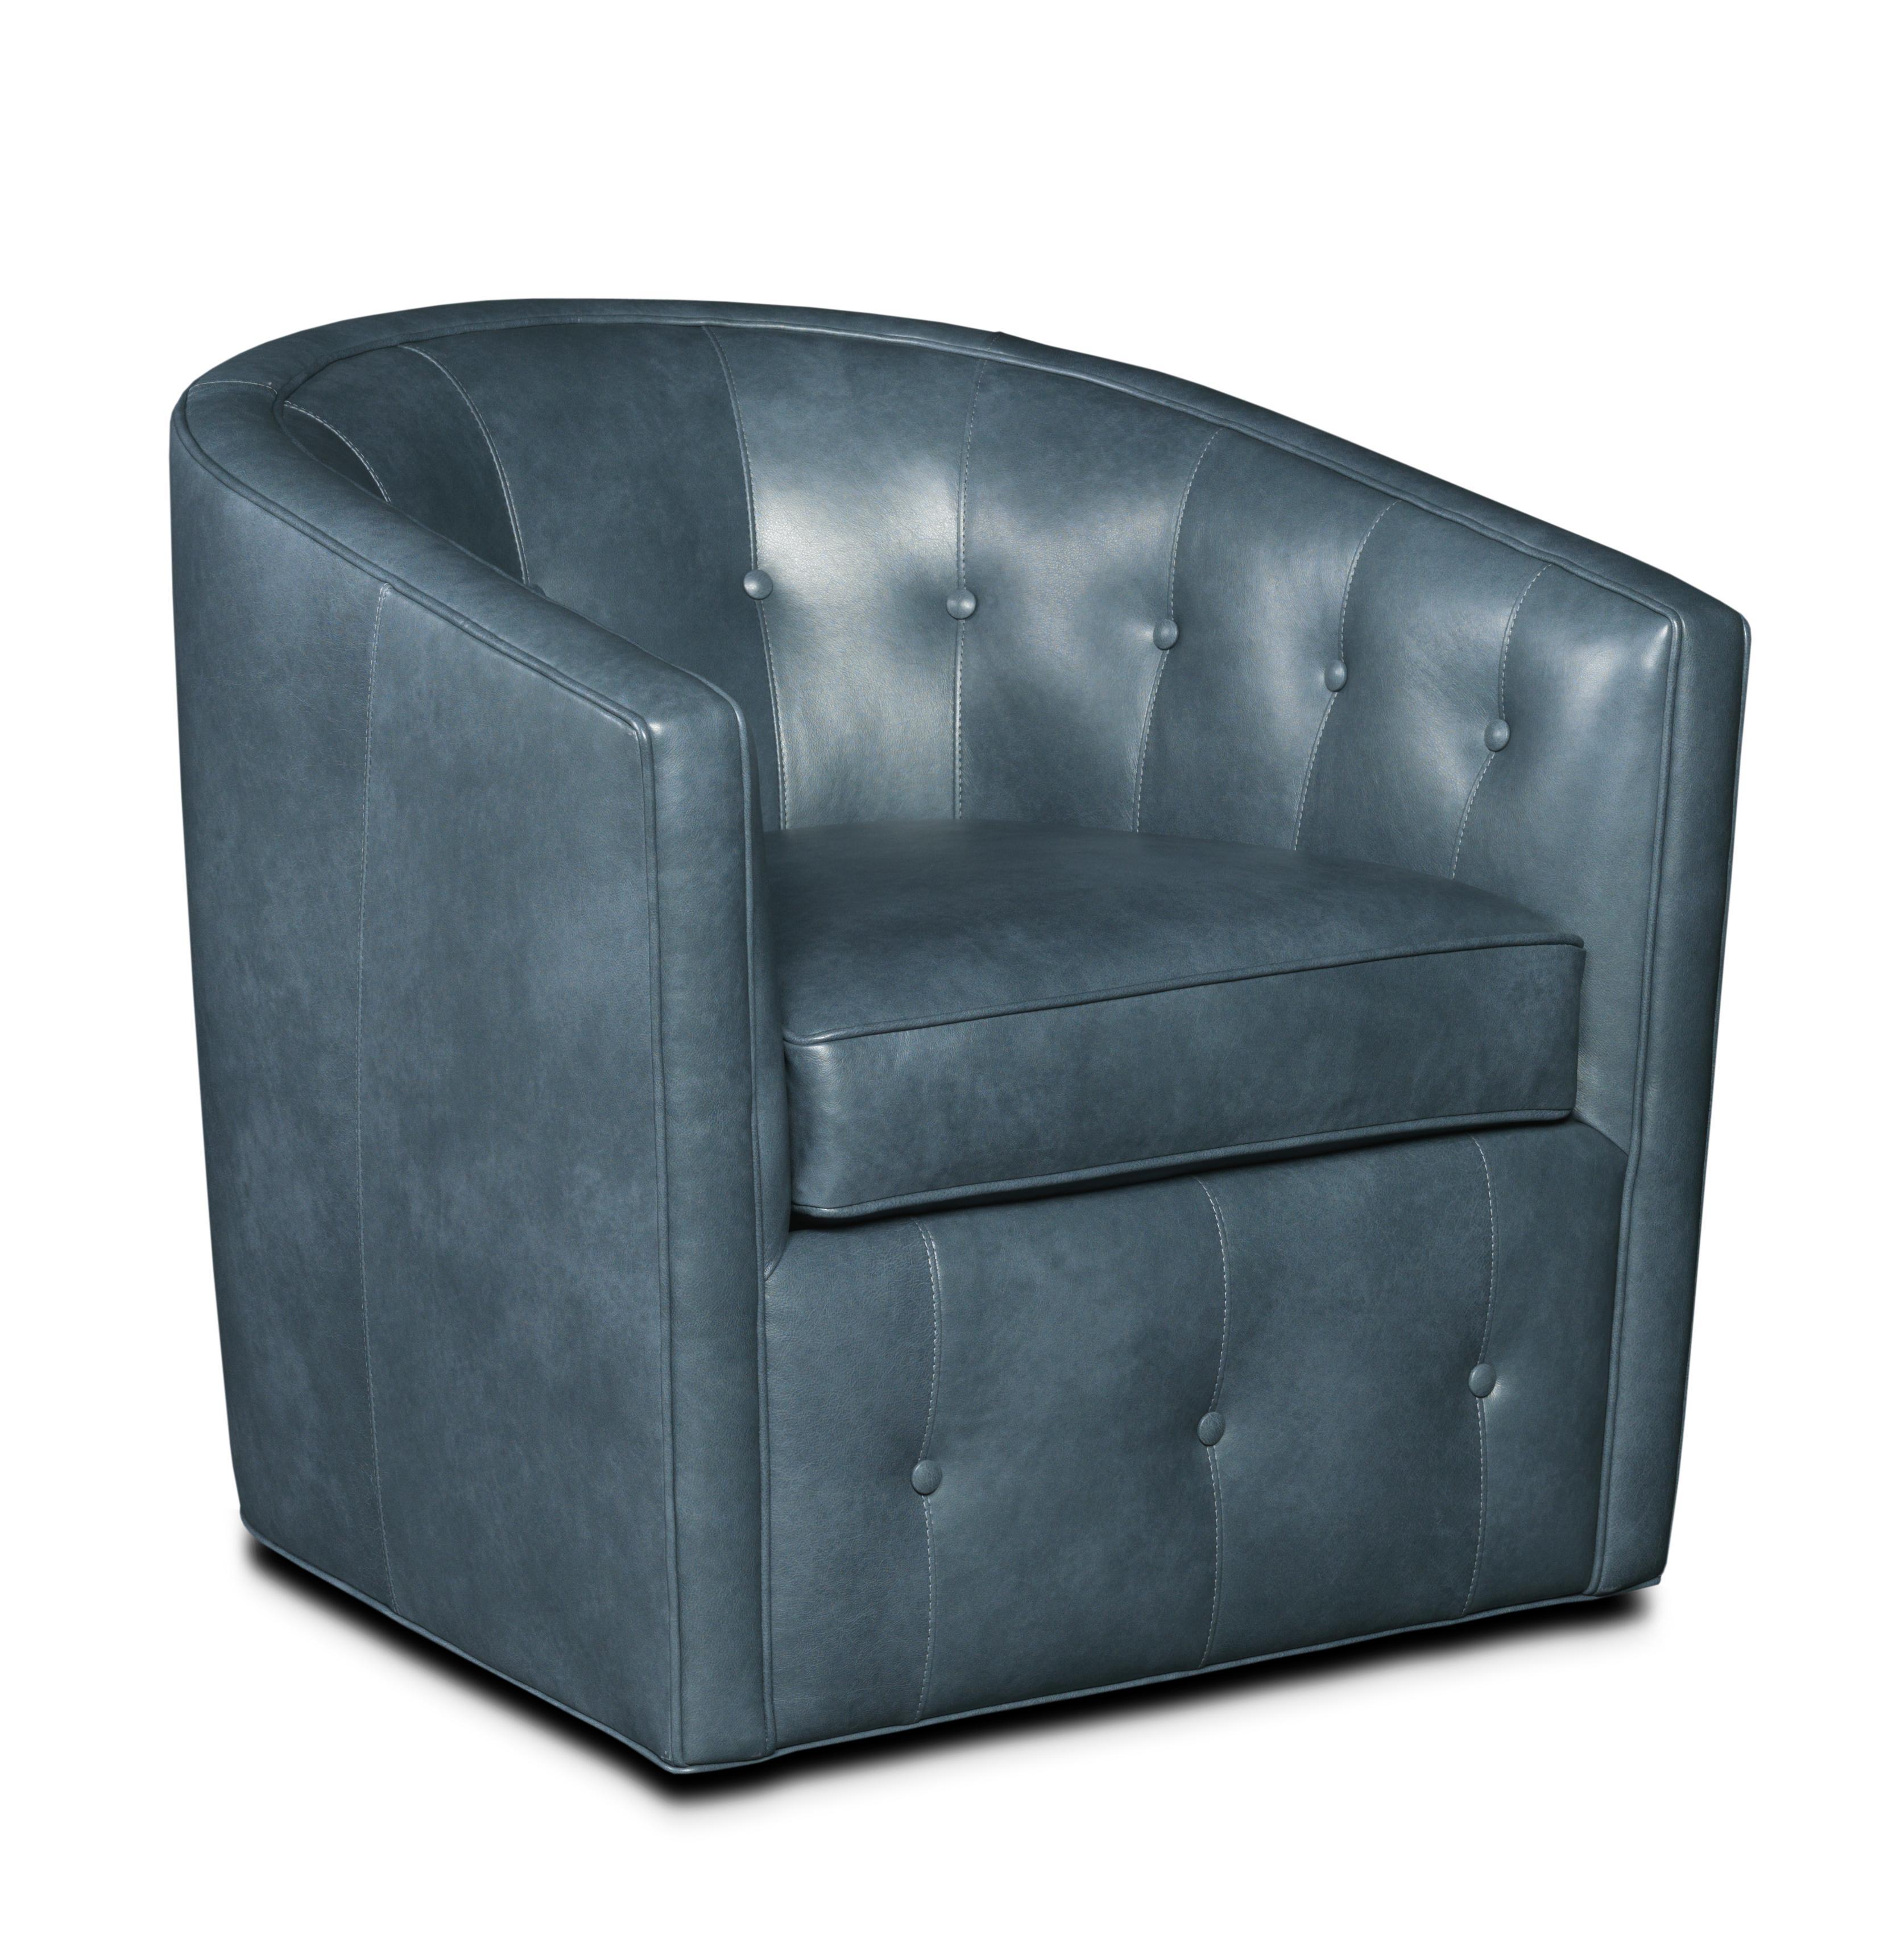 furniture chair swivelchair australia carrera select perth lounges colour swivel tub western